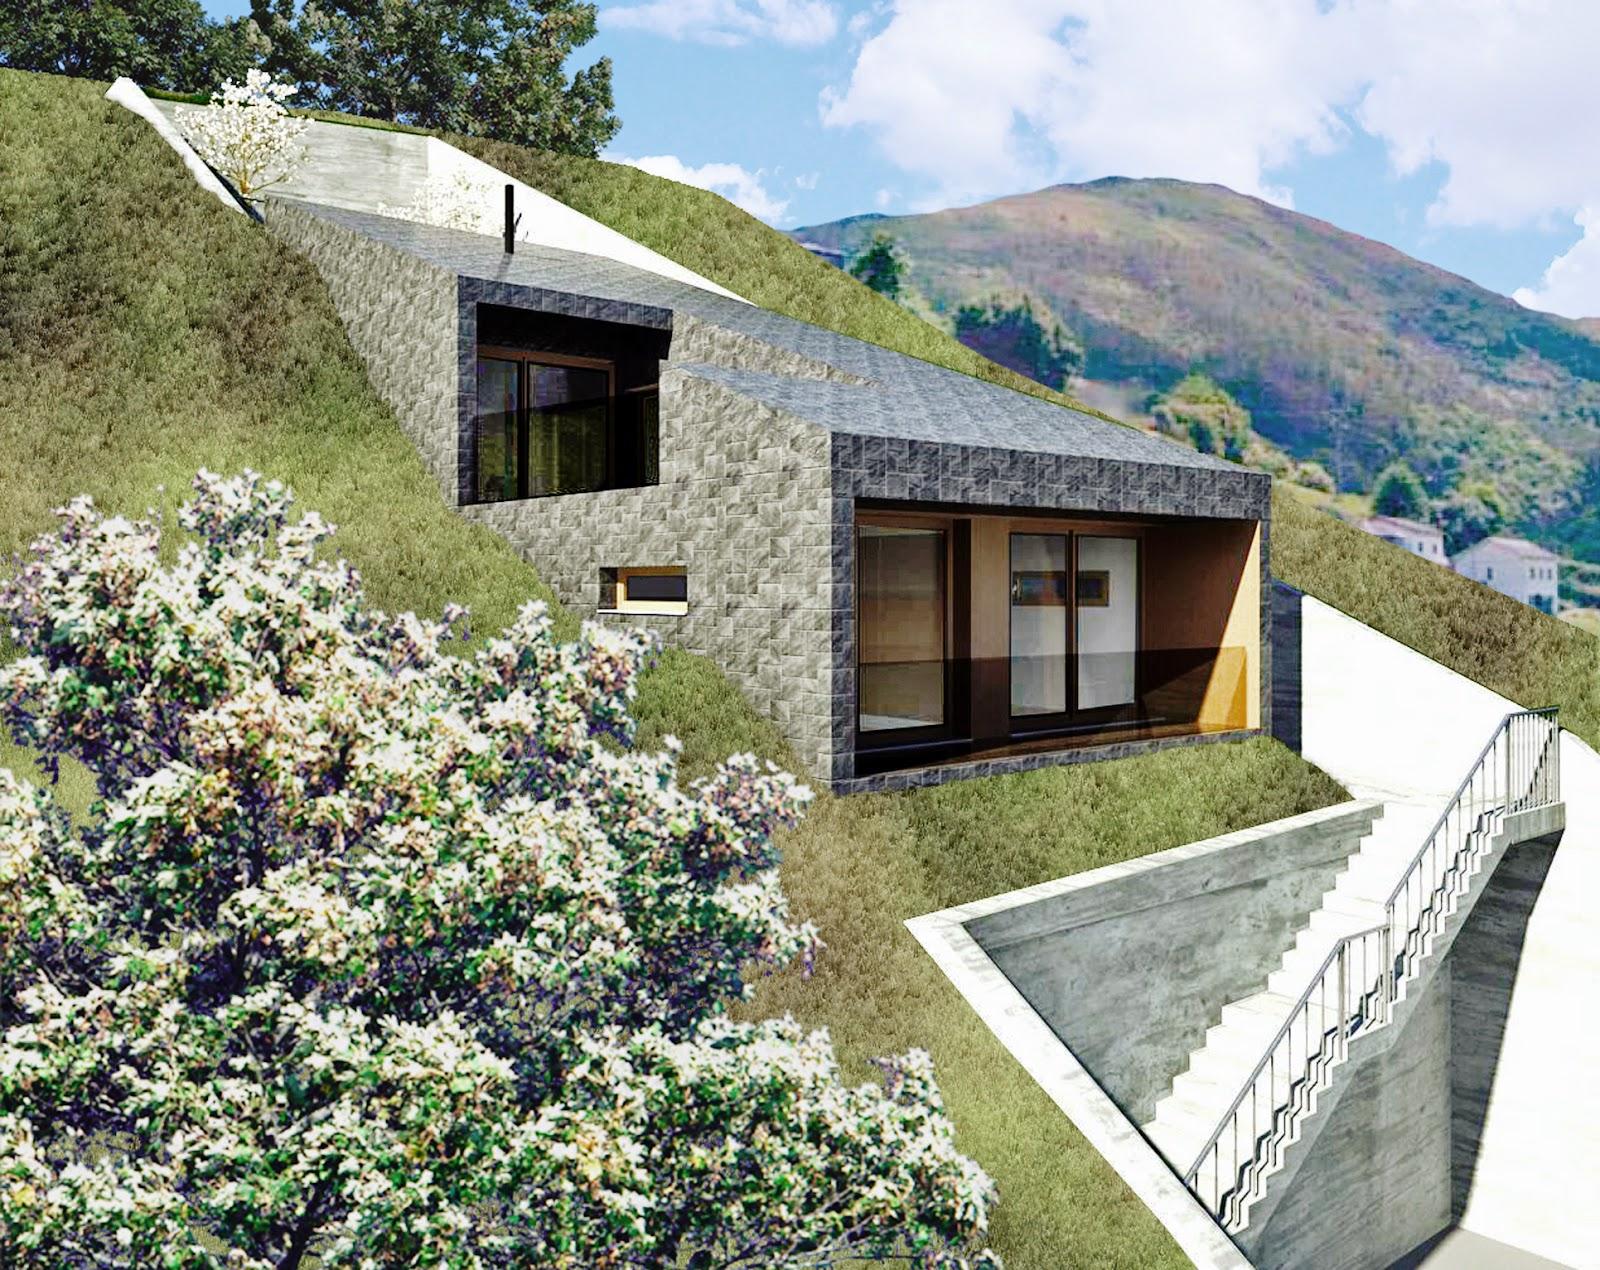 Bau estudio arquitectos proyecto b sico para vivienda - Arquitectos asturias ...